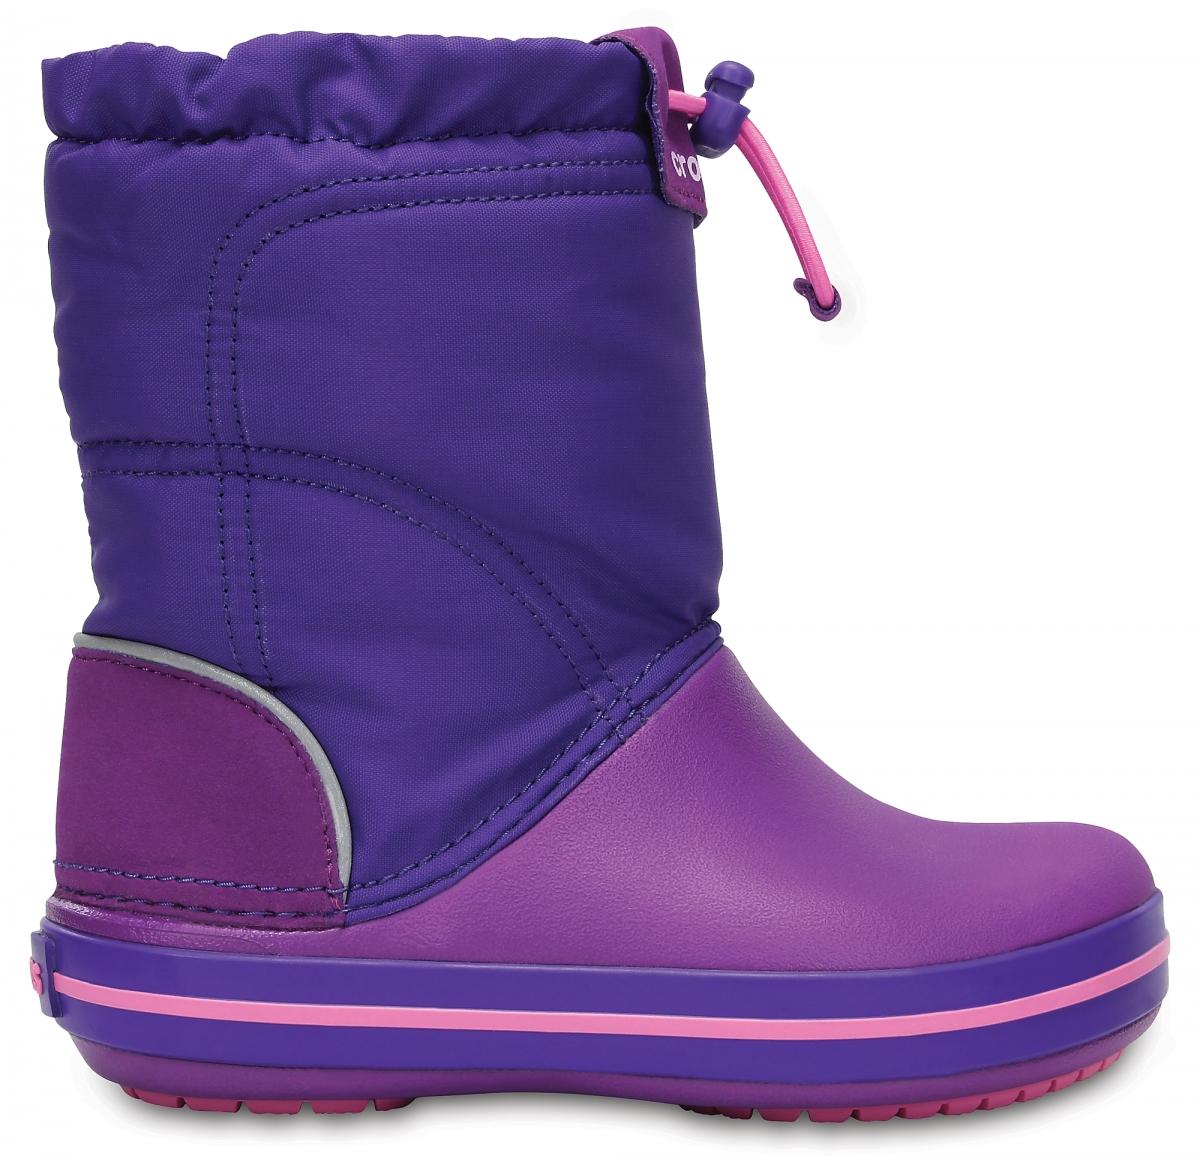 Crocs Crocband LodgePoint Boot Kids - Amethyst/Ultraviolet, C10 (27-28)